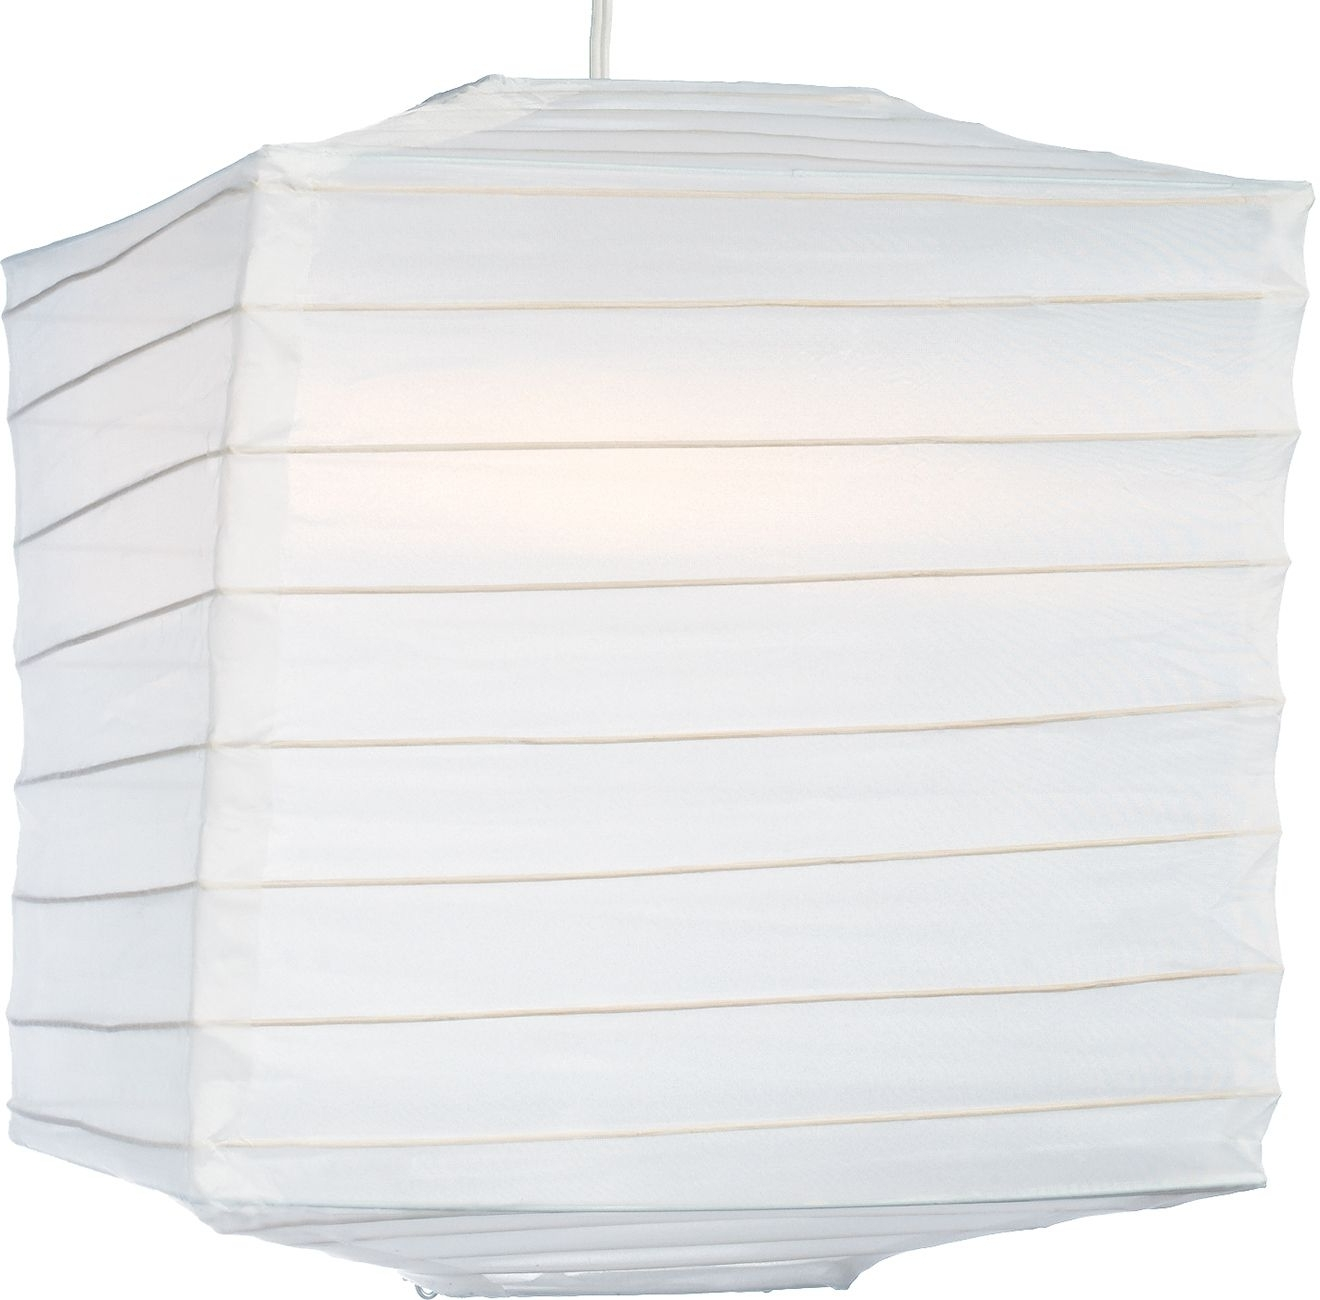 2018 White 10 Inch Square Outdoor Nylon Lantern – Luna Bazaar Regarding Outdoor Nylon Lanterns (Gallery 9 of 20)